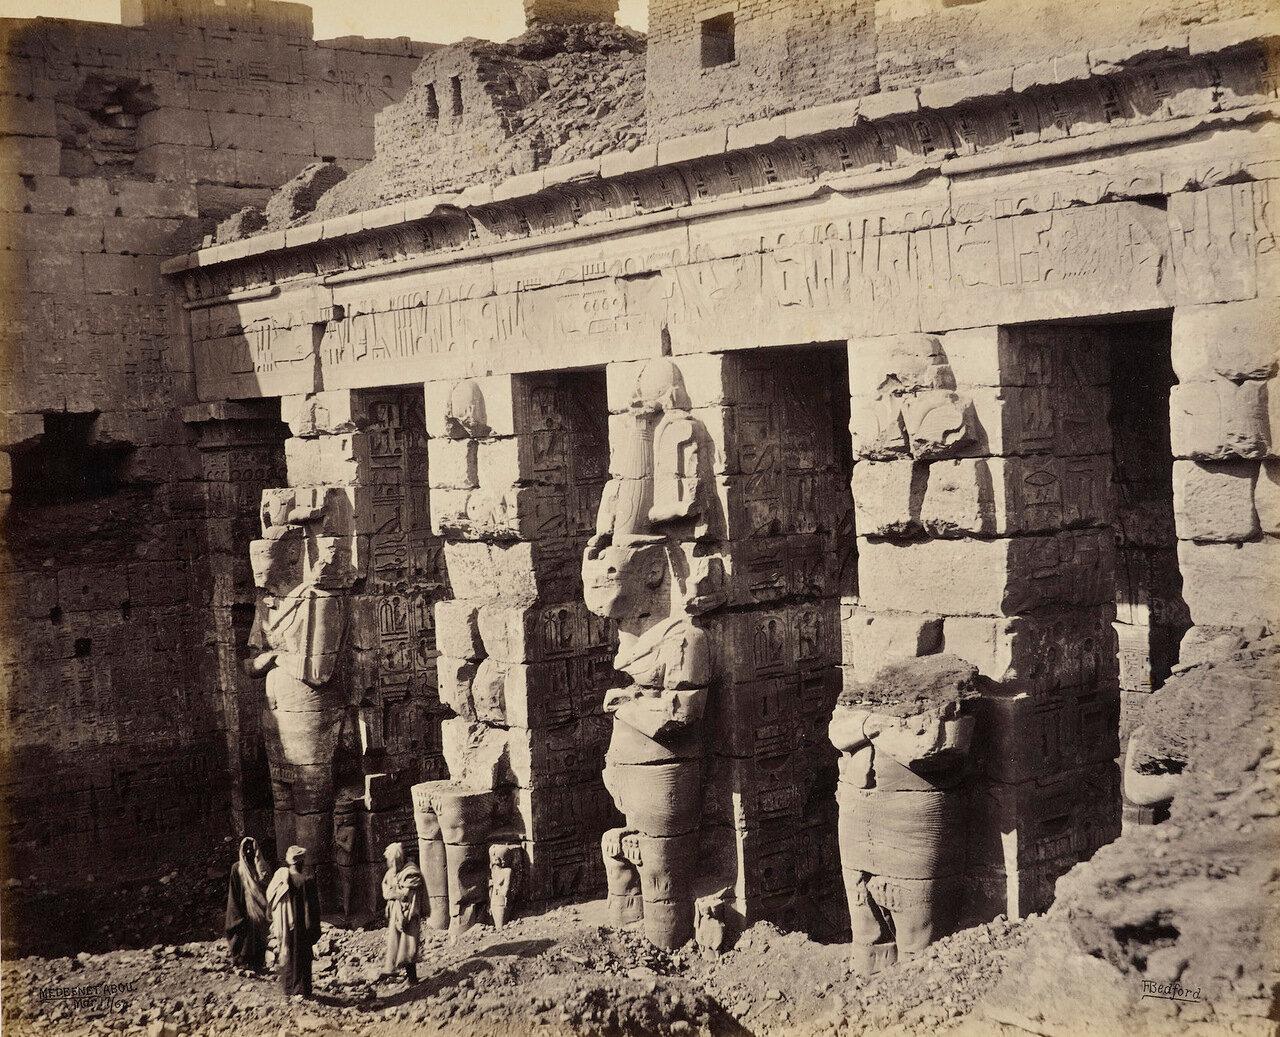 17 марта 1862. Колоннада в храме Мединет Абу